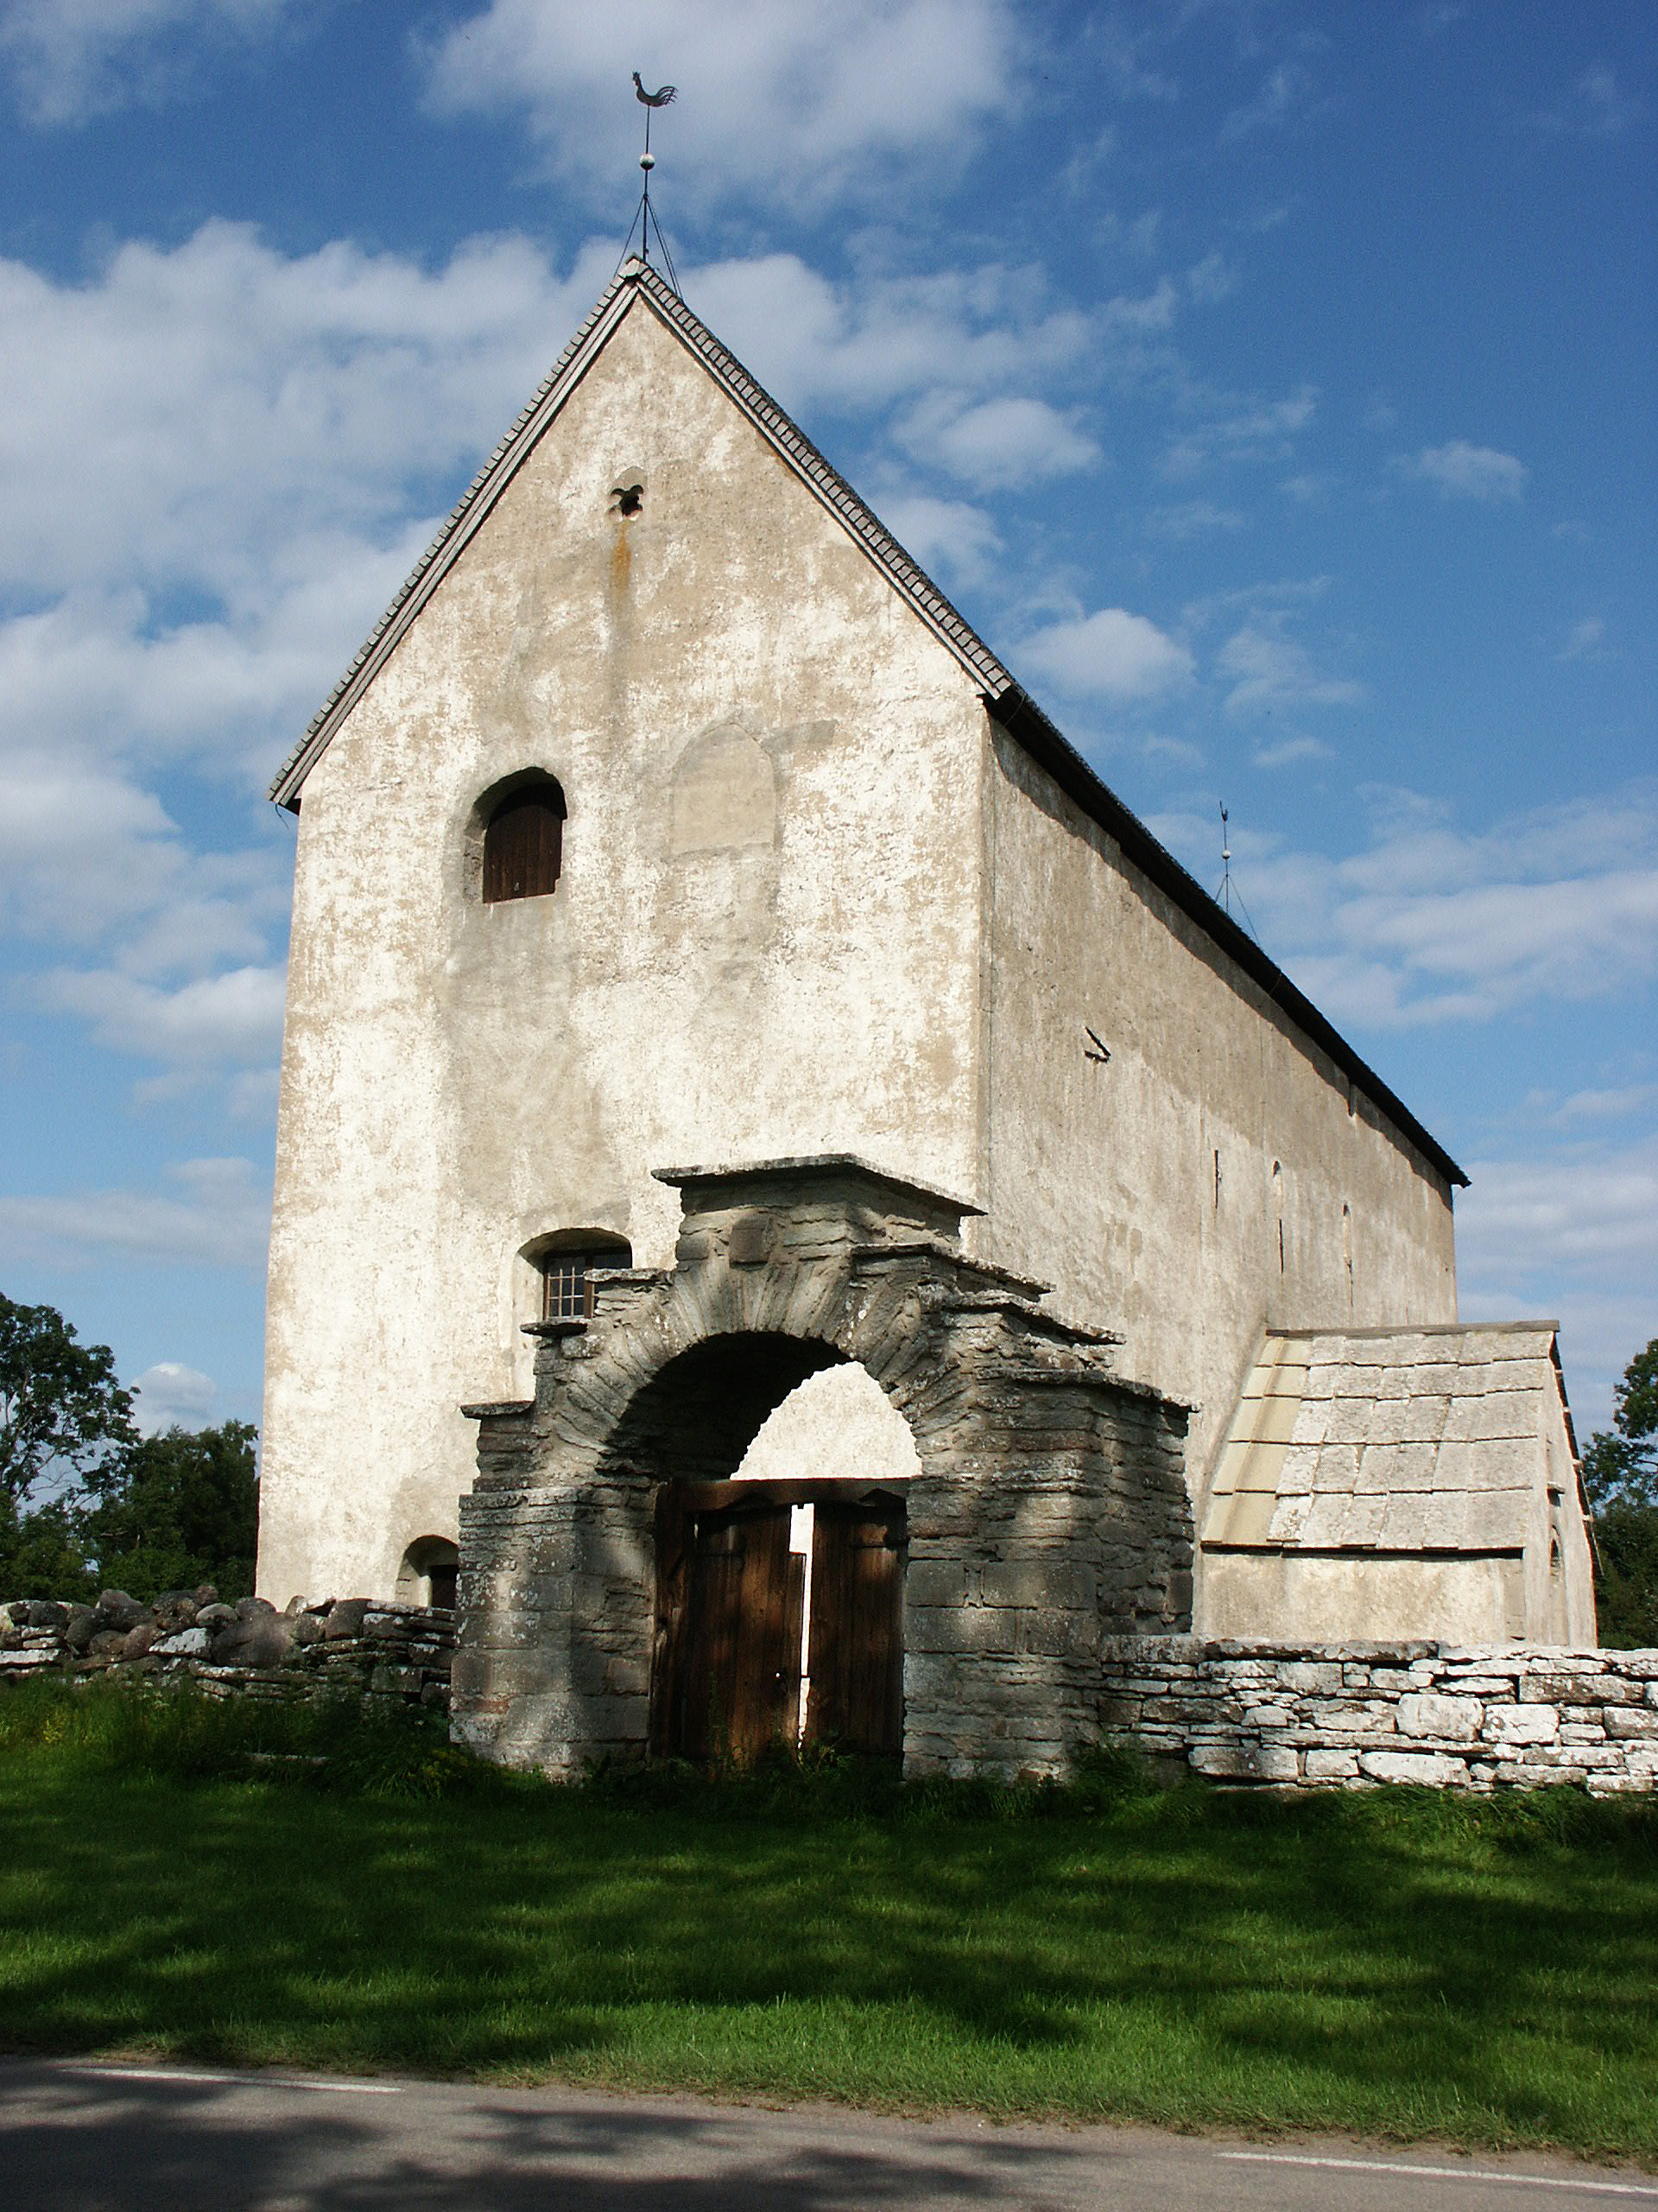 Church Buildings For Sale In Grand Rapids Mii